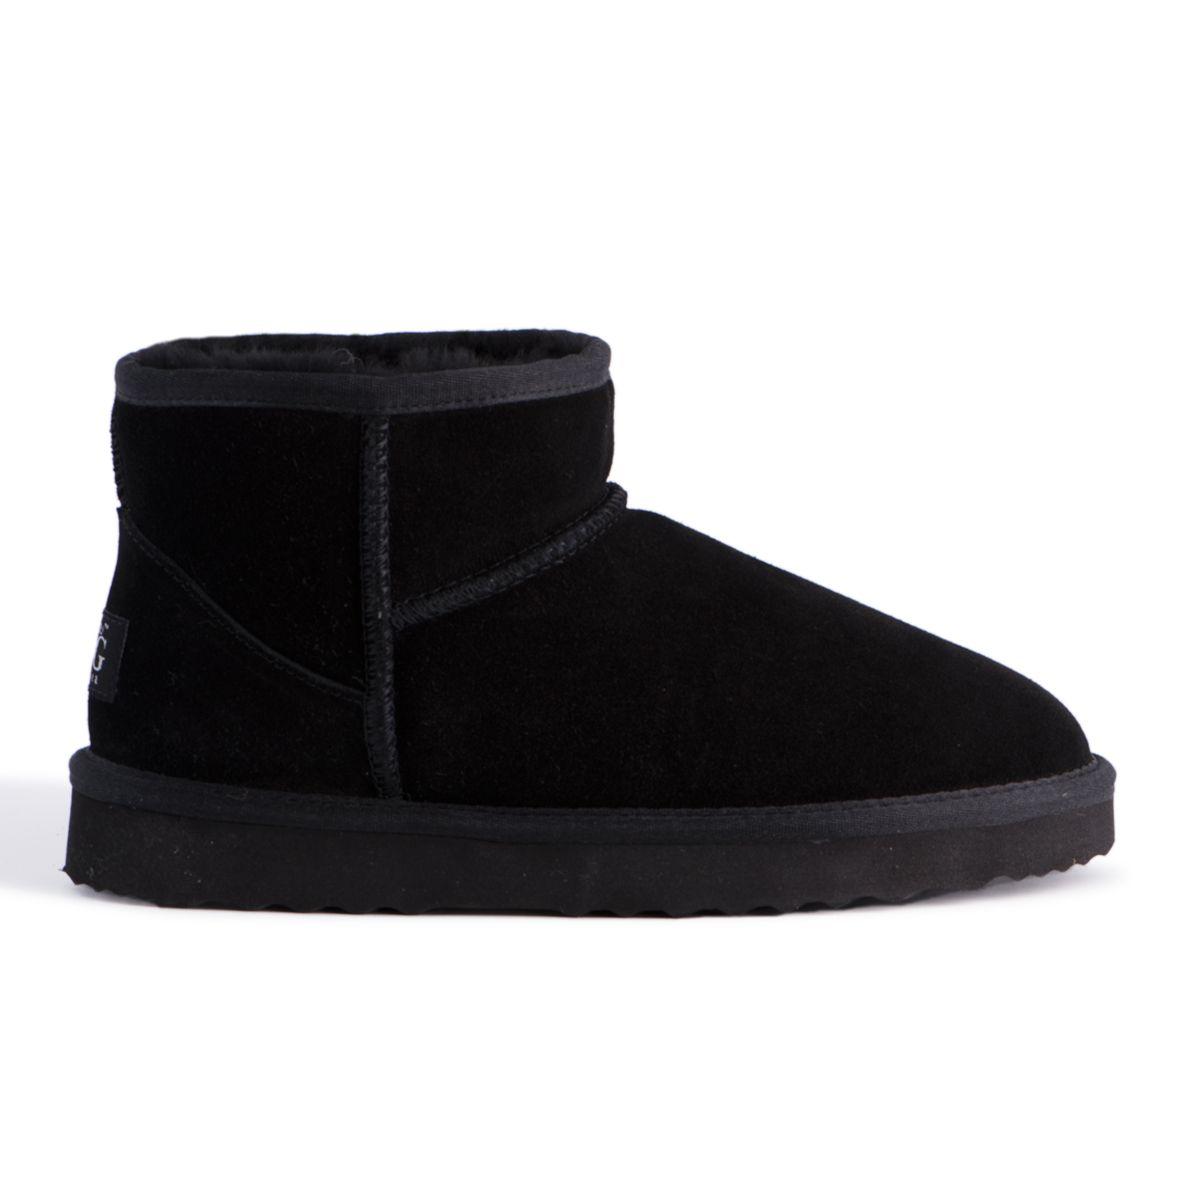 "Aus Wooli ""Bondi"" Australia Short Sheepskin Ankle Boot, Black"